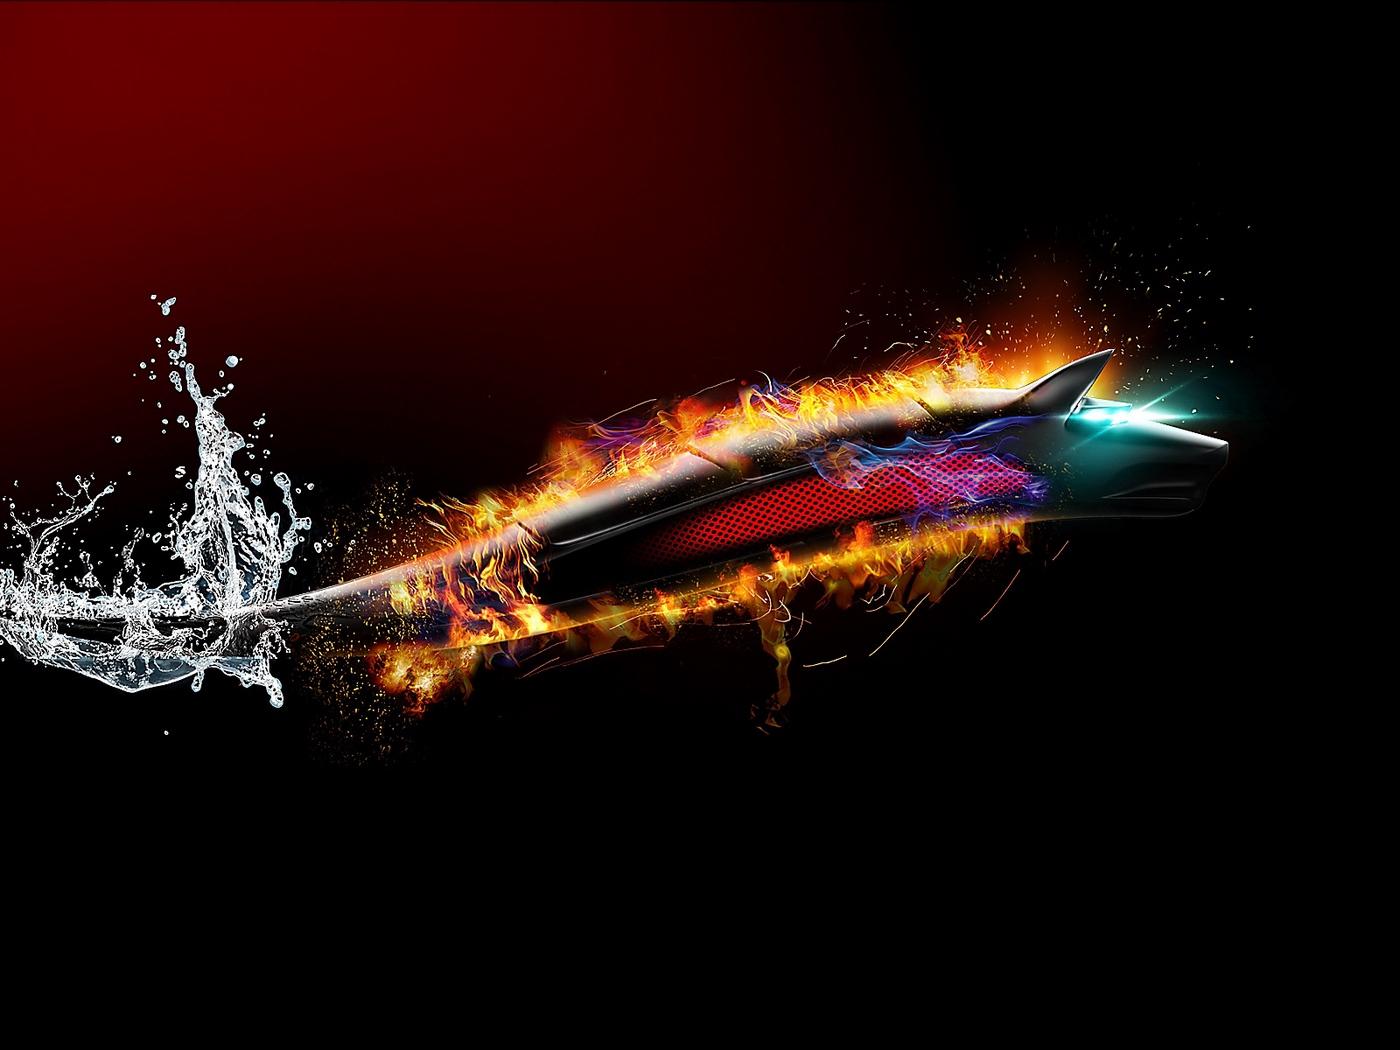 Download wallpaper 1400x1050 dragon dark wolf bitdefender 1400x1050